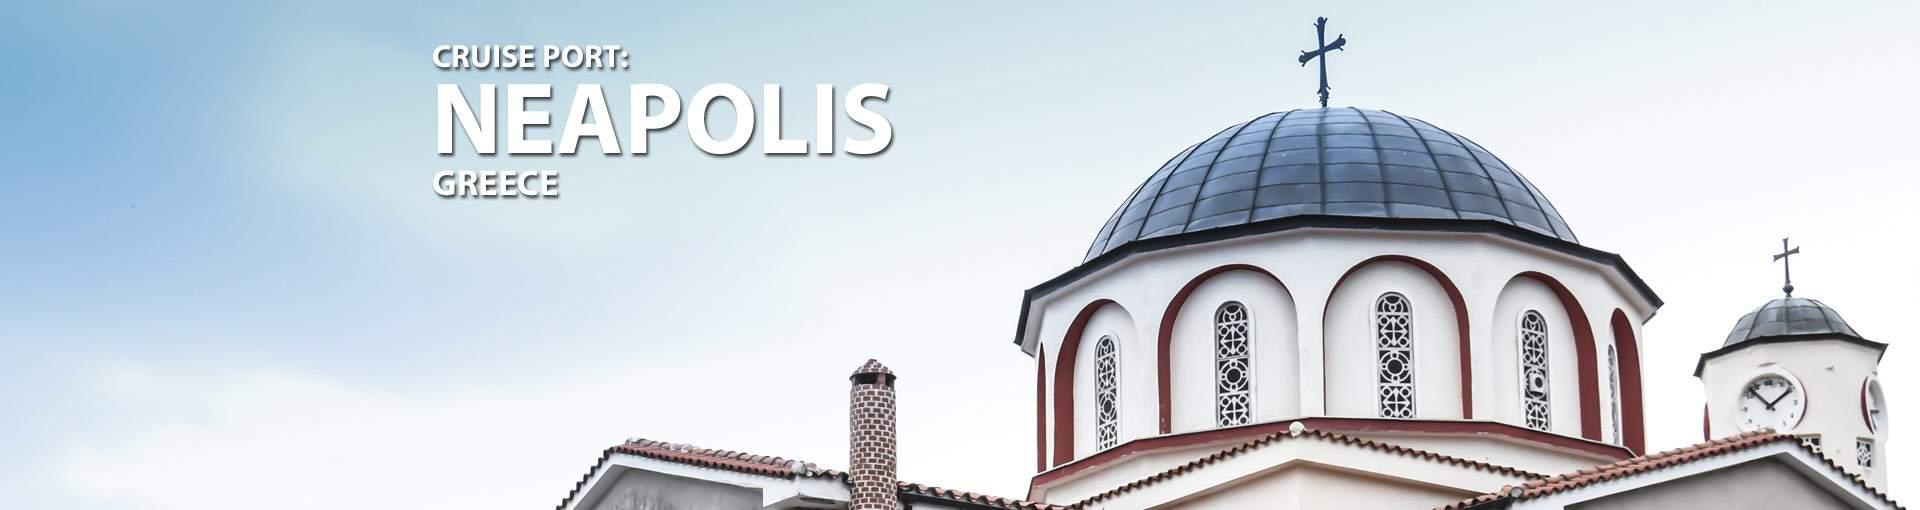 Neapolis, Greece Cruise Port